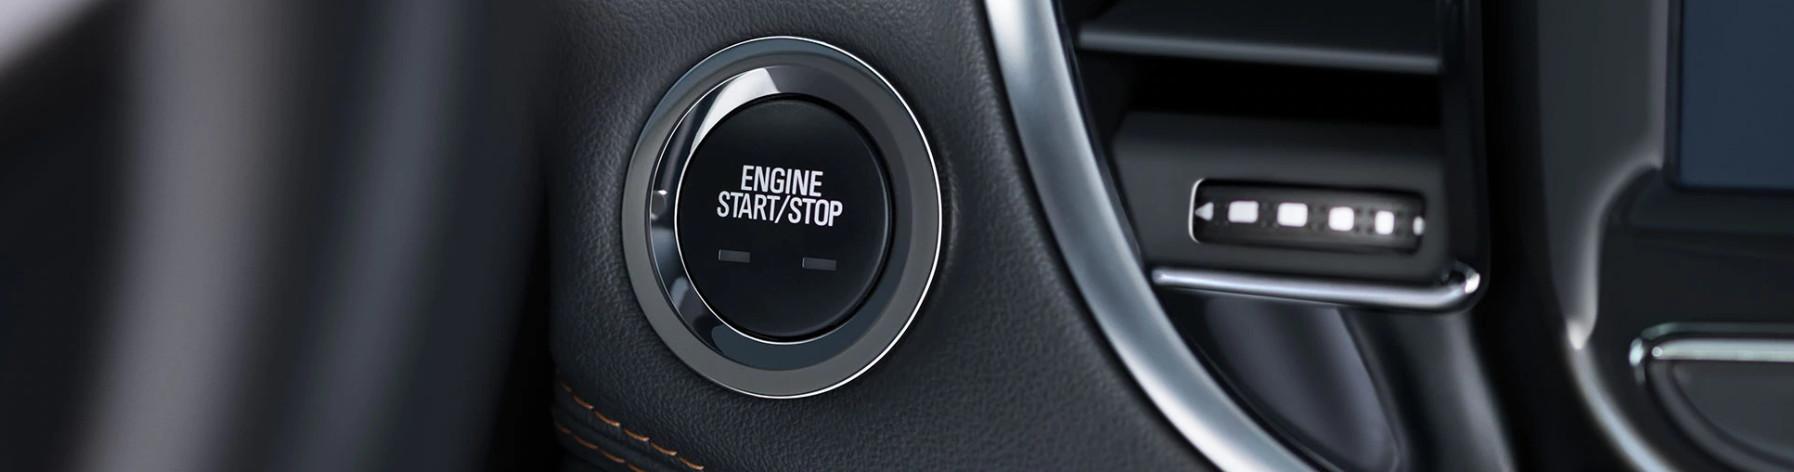 2020 Trax Push Button Start